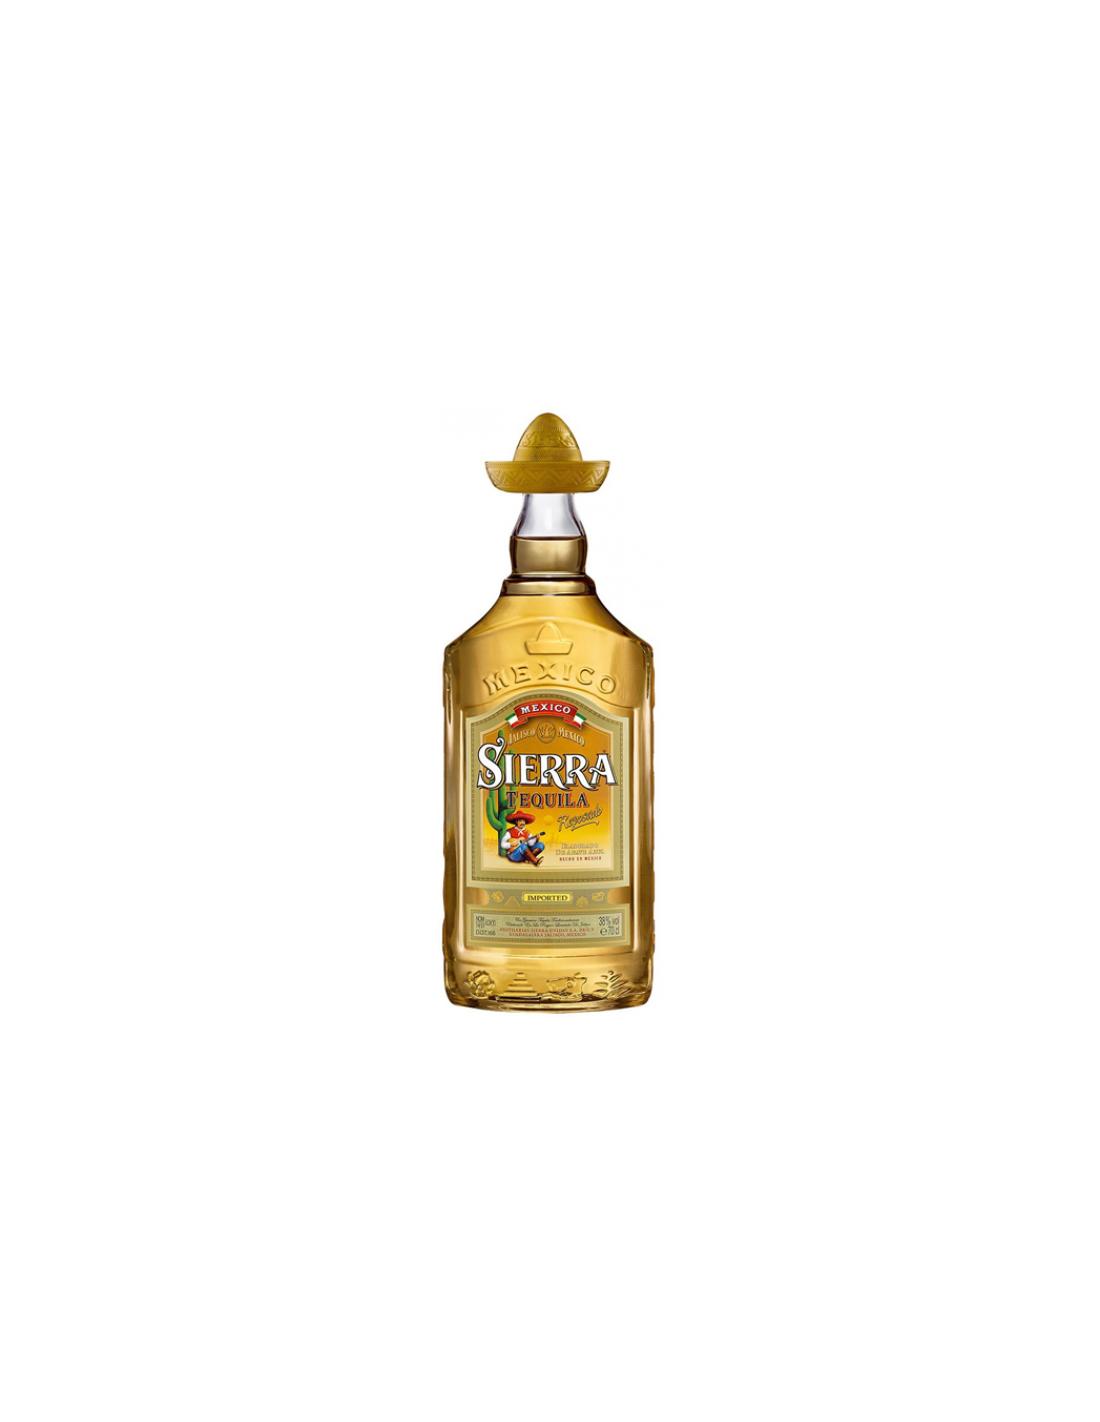 Tequila aurie Sierra Reposado 0.7L, 38% alc., Mexic